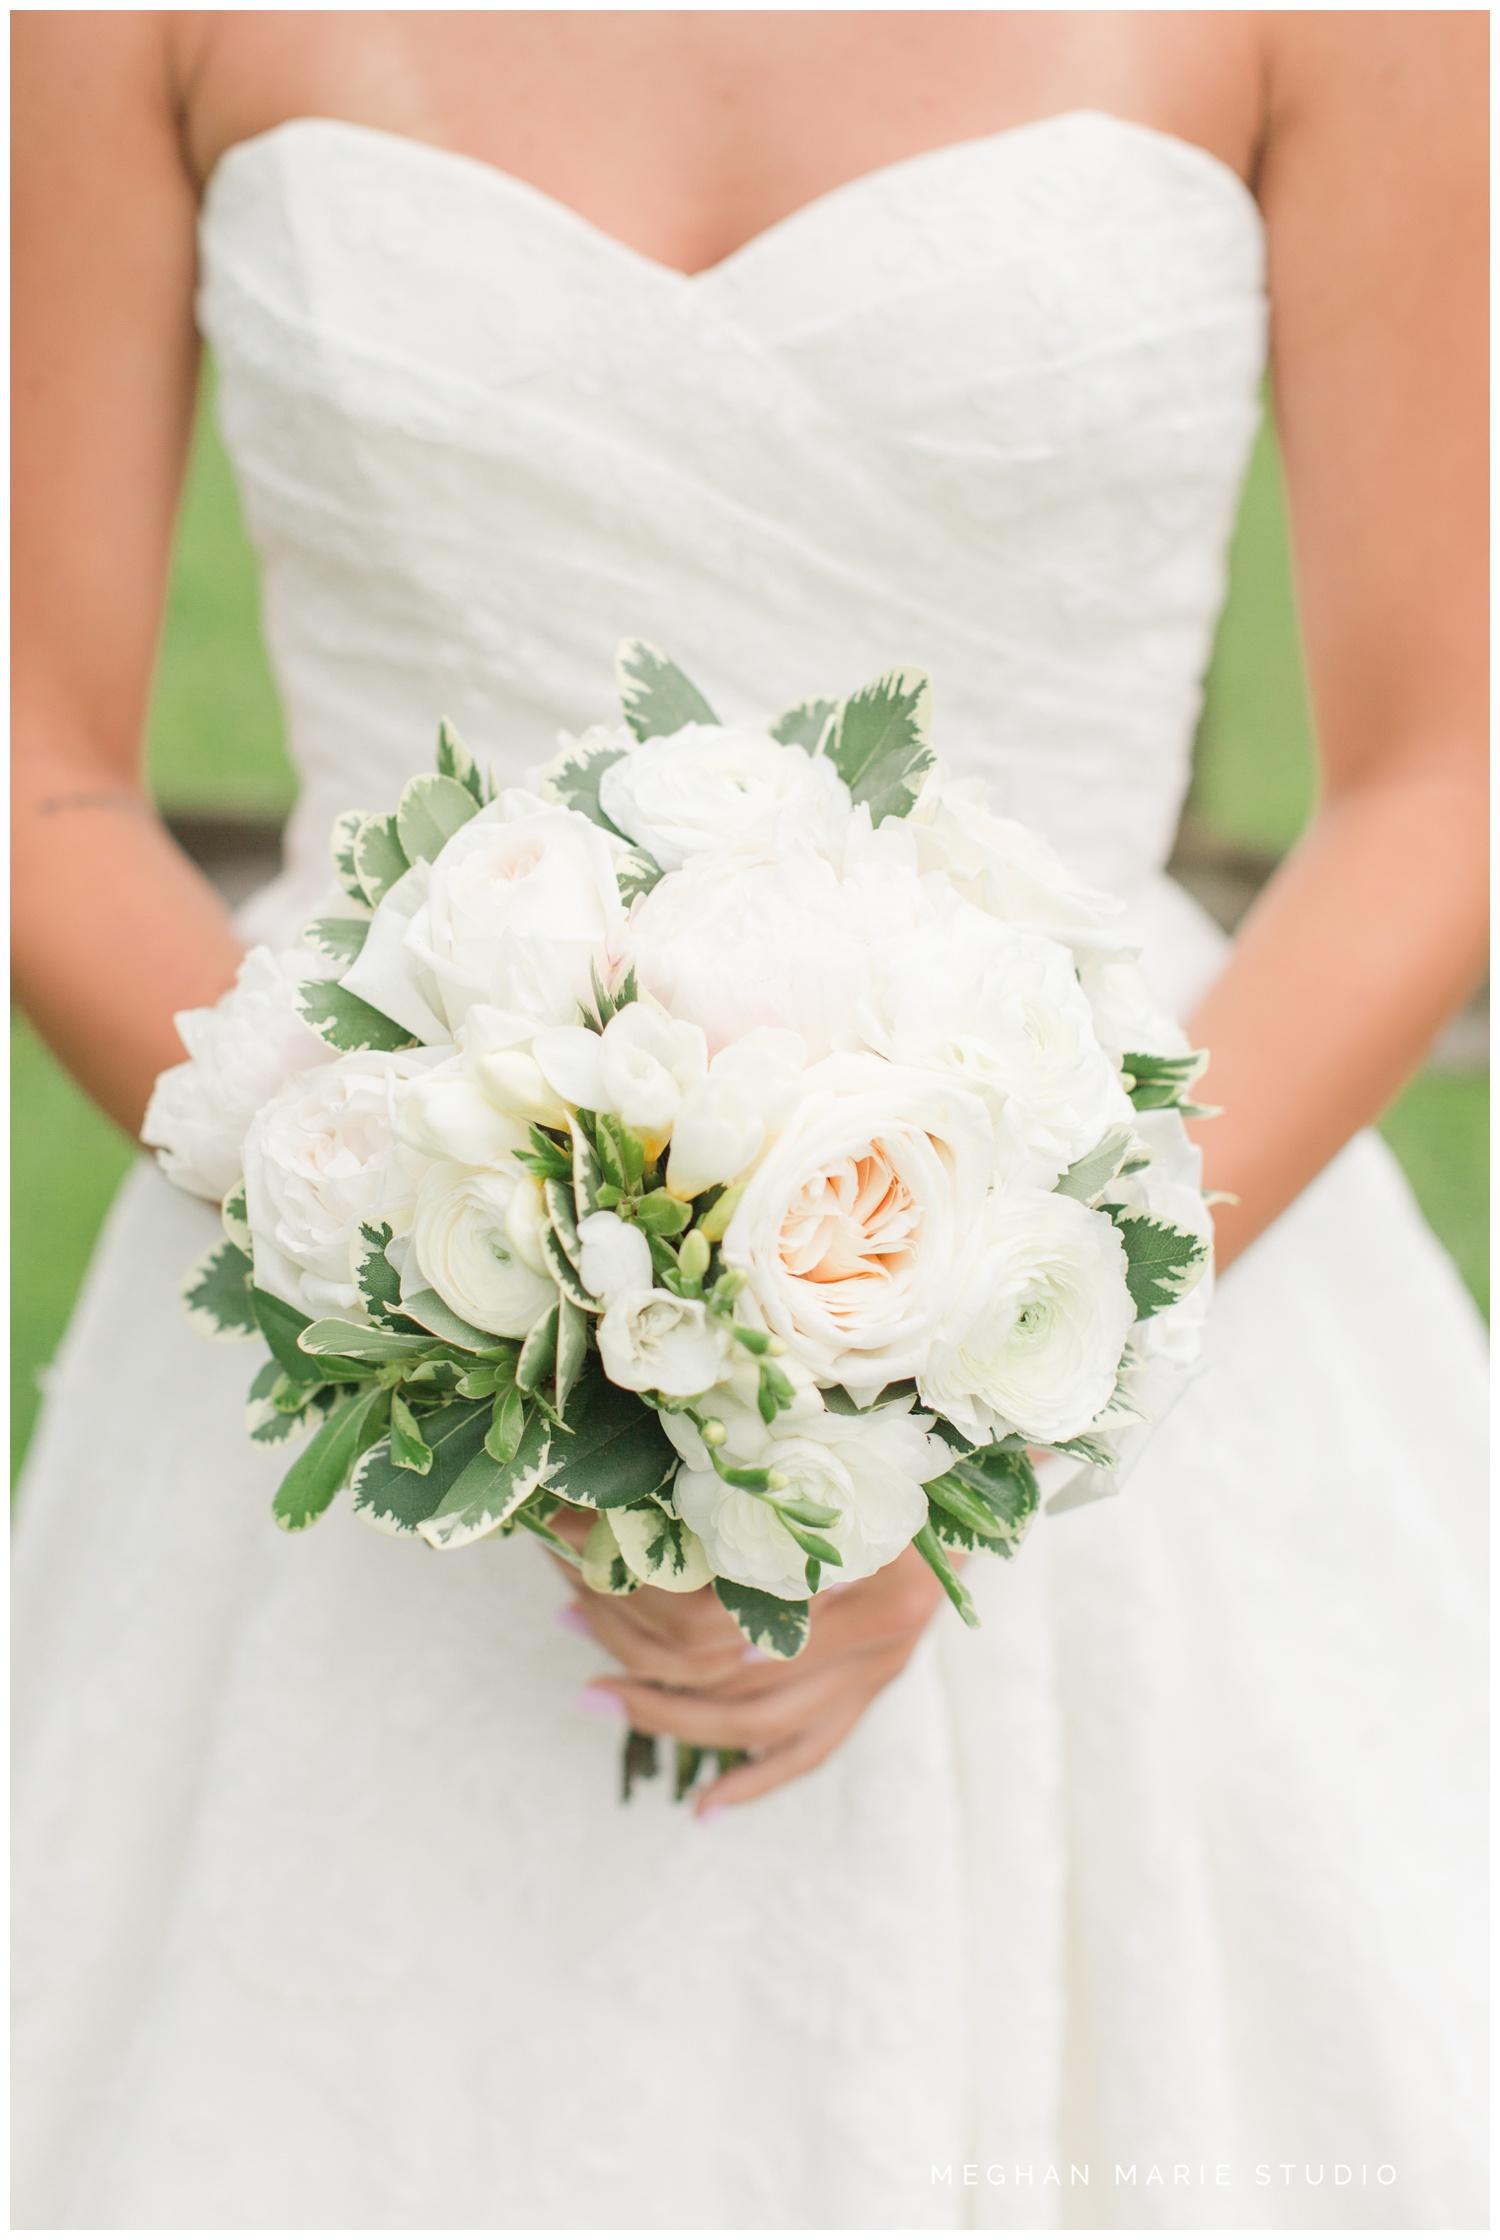 meghan marie studio wedding photographer ohio dayton cincinnati columbus outdoor rural vintage rustic DIY wedding country chic pinterest bridal gown beauty_0684.jpg